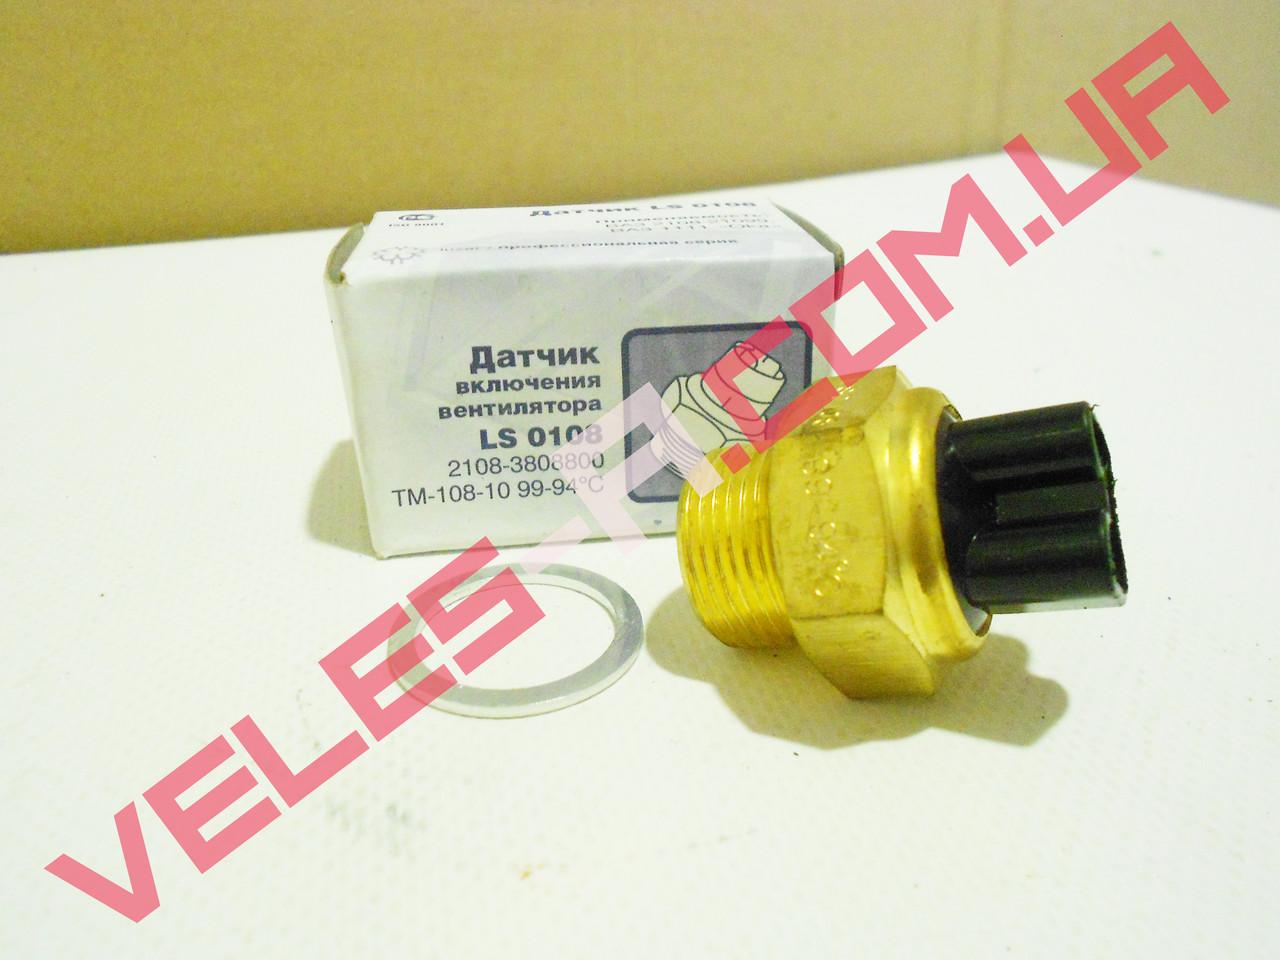 Датчик включения вентилятора Ваз 2101-2107, 2108-2115 (99-94) Лузар